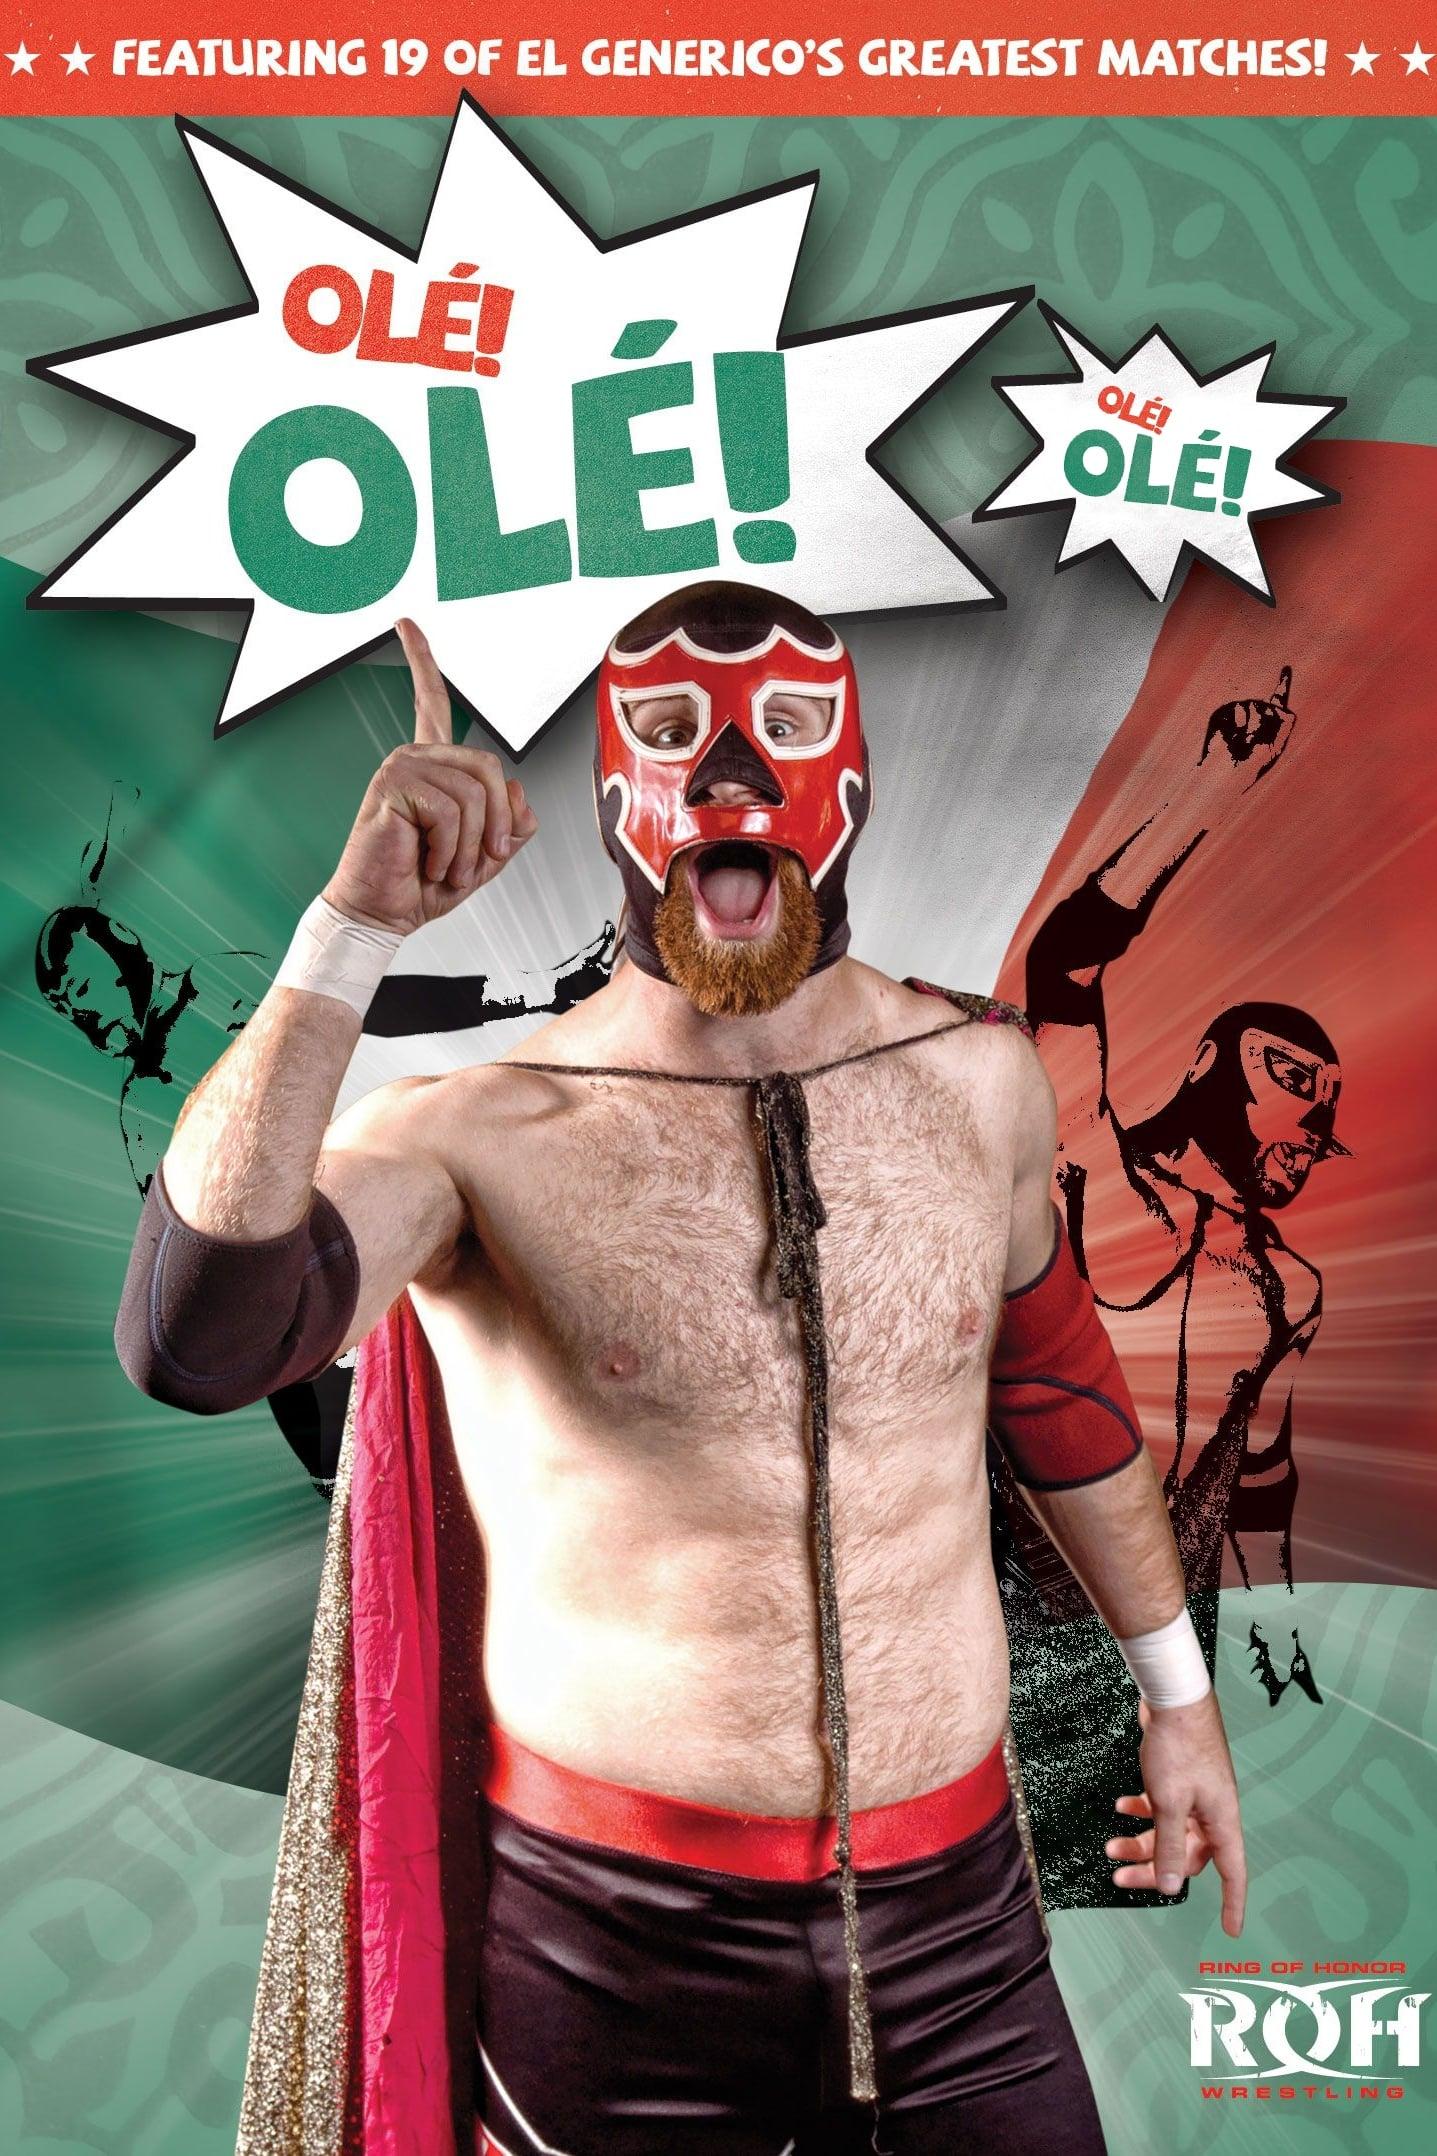 ROH: El Generico: Ole! Ole!